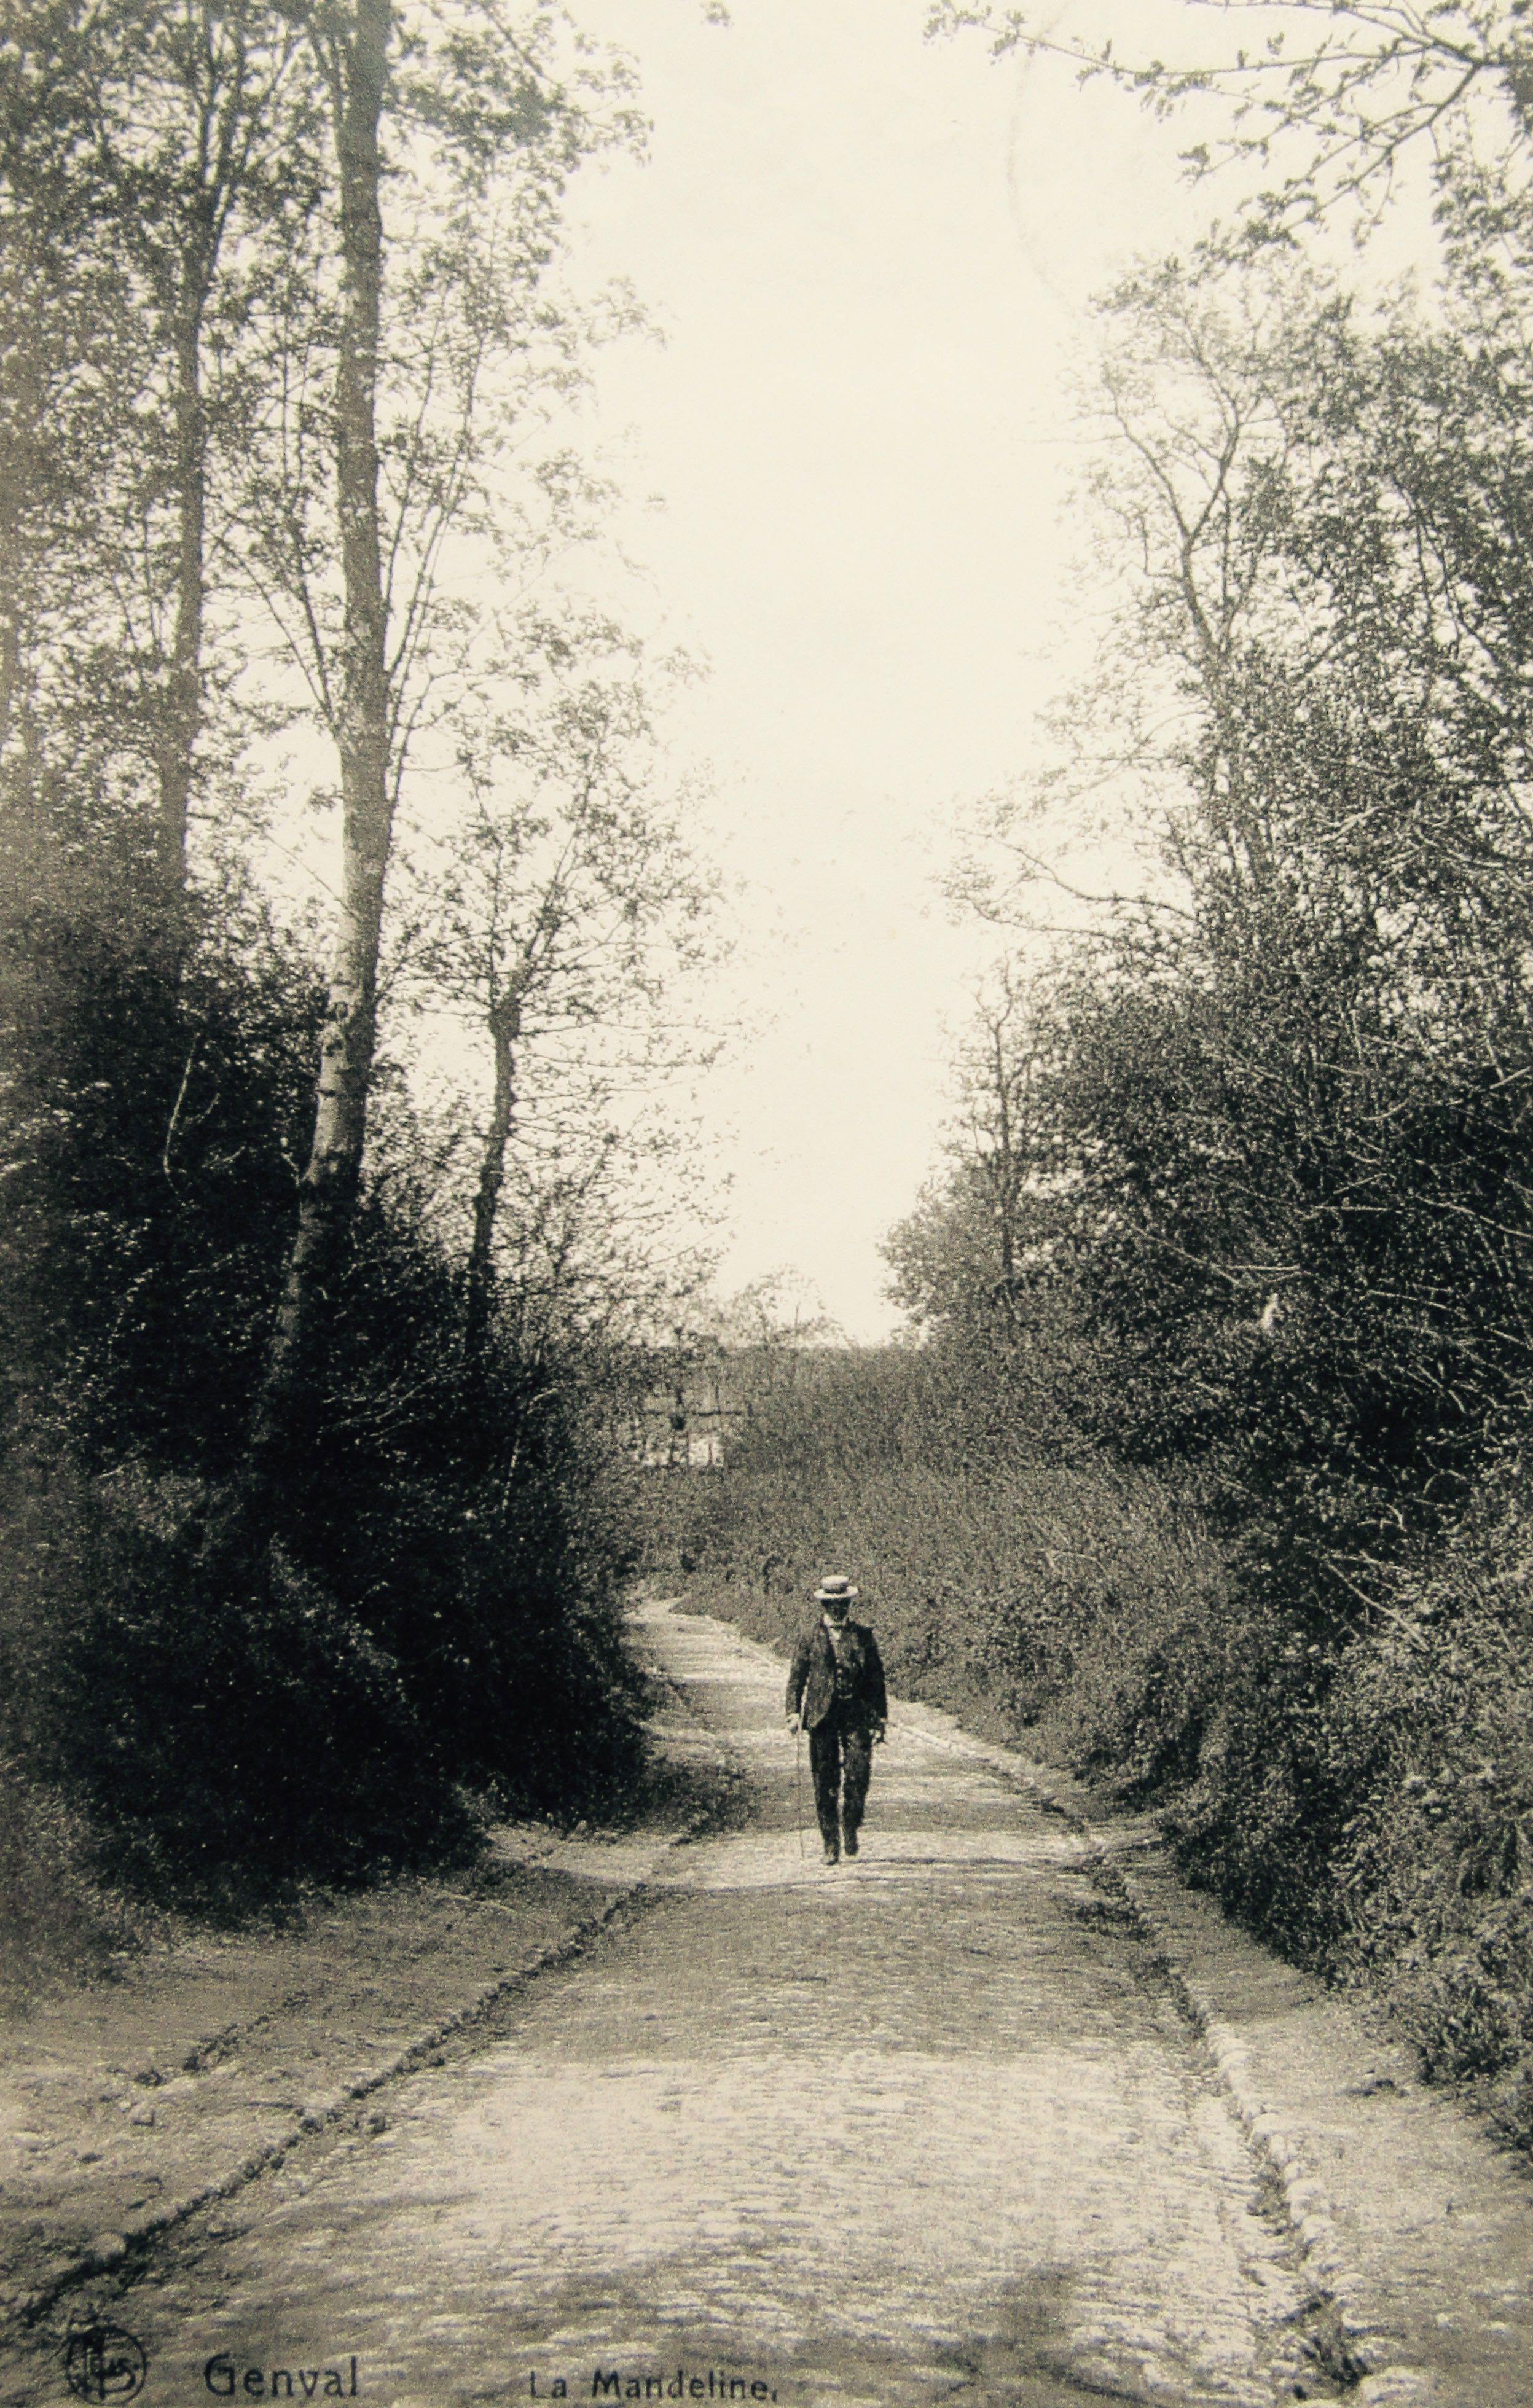 La Manteline Genval 1906 coll CHR